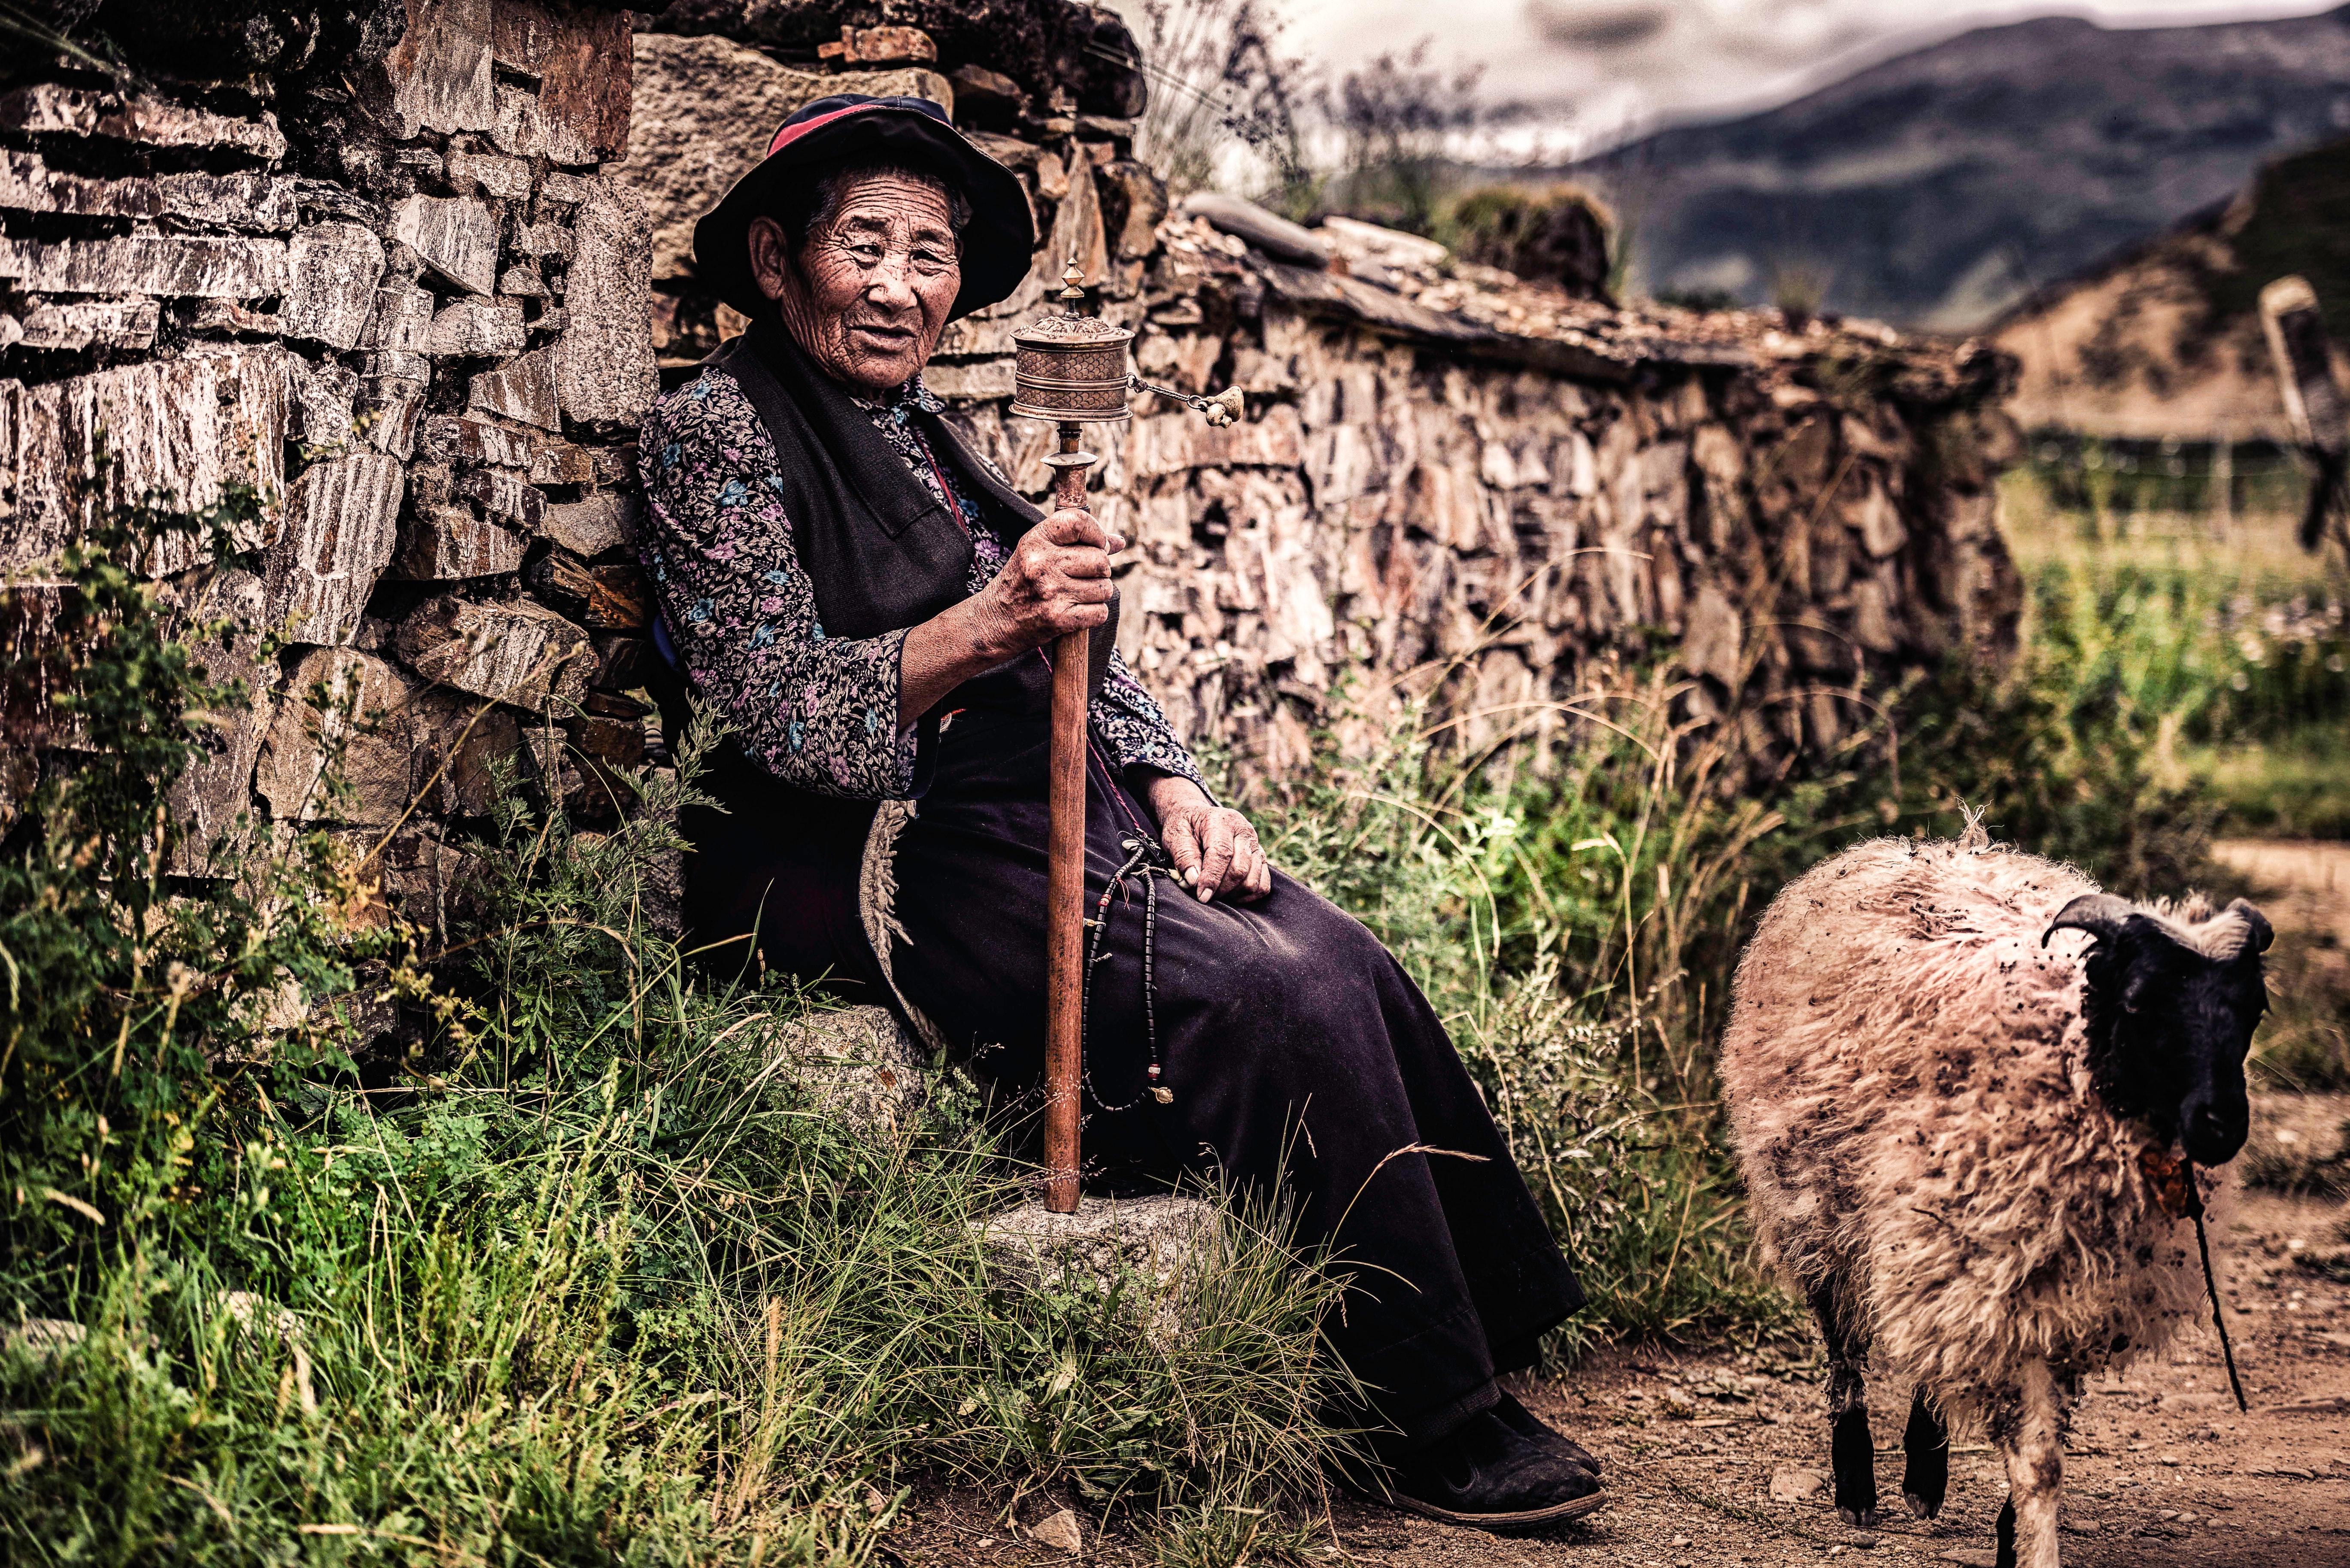 Woman sitting on rock beside wall and near sheep photo